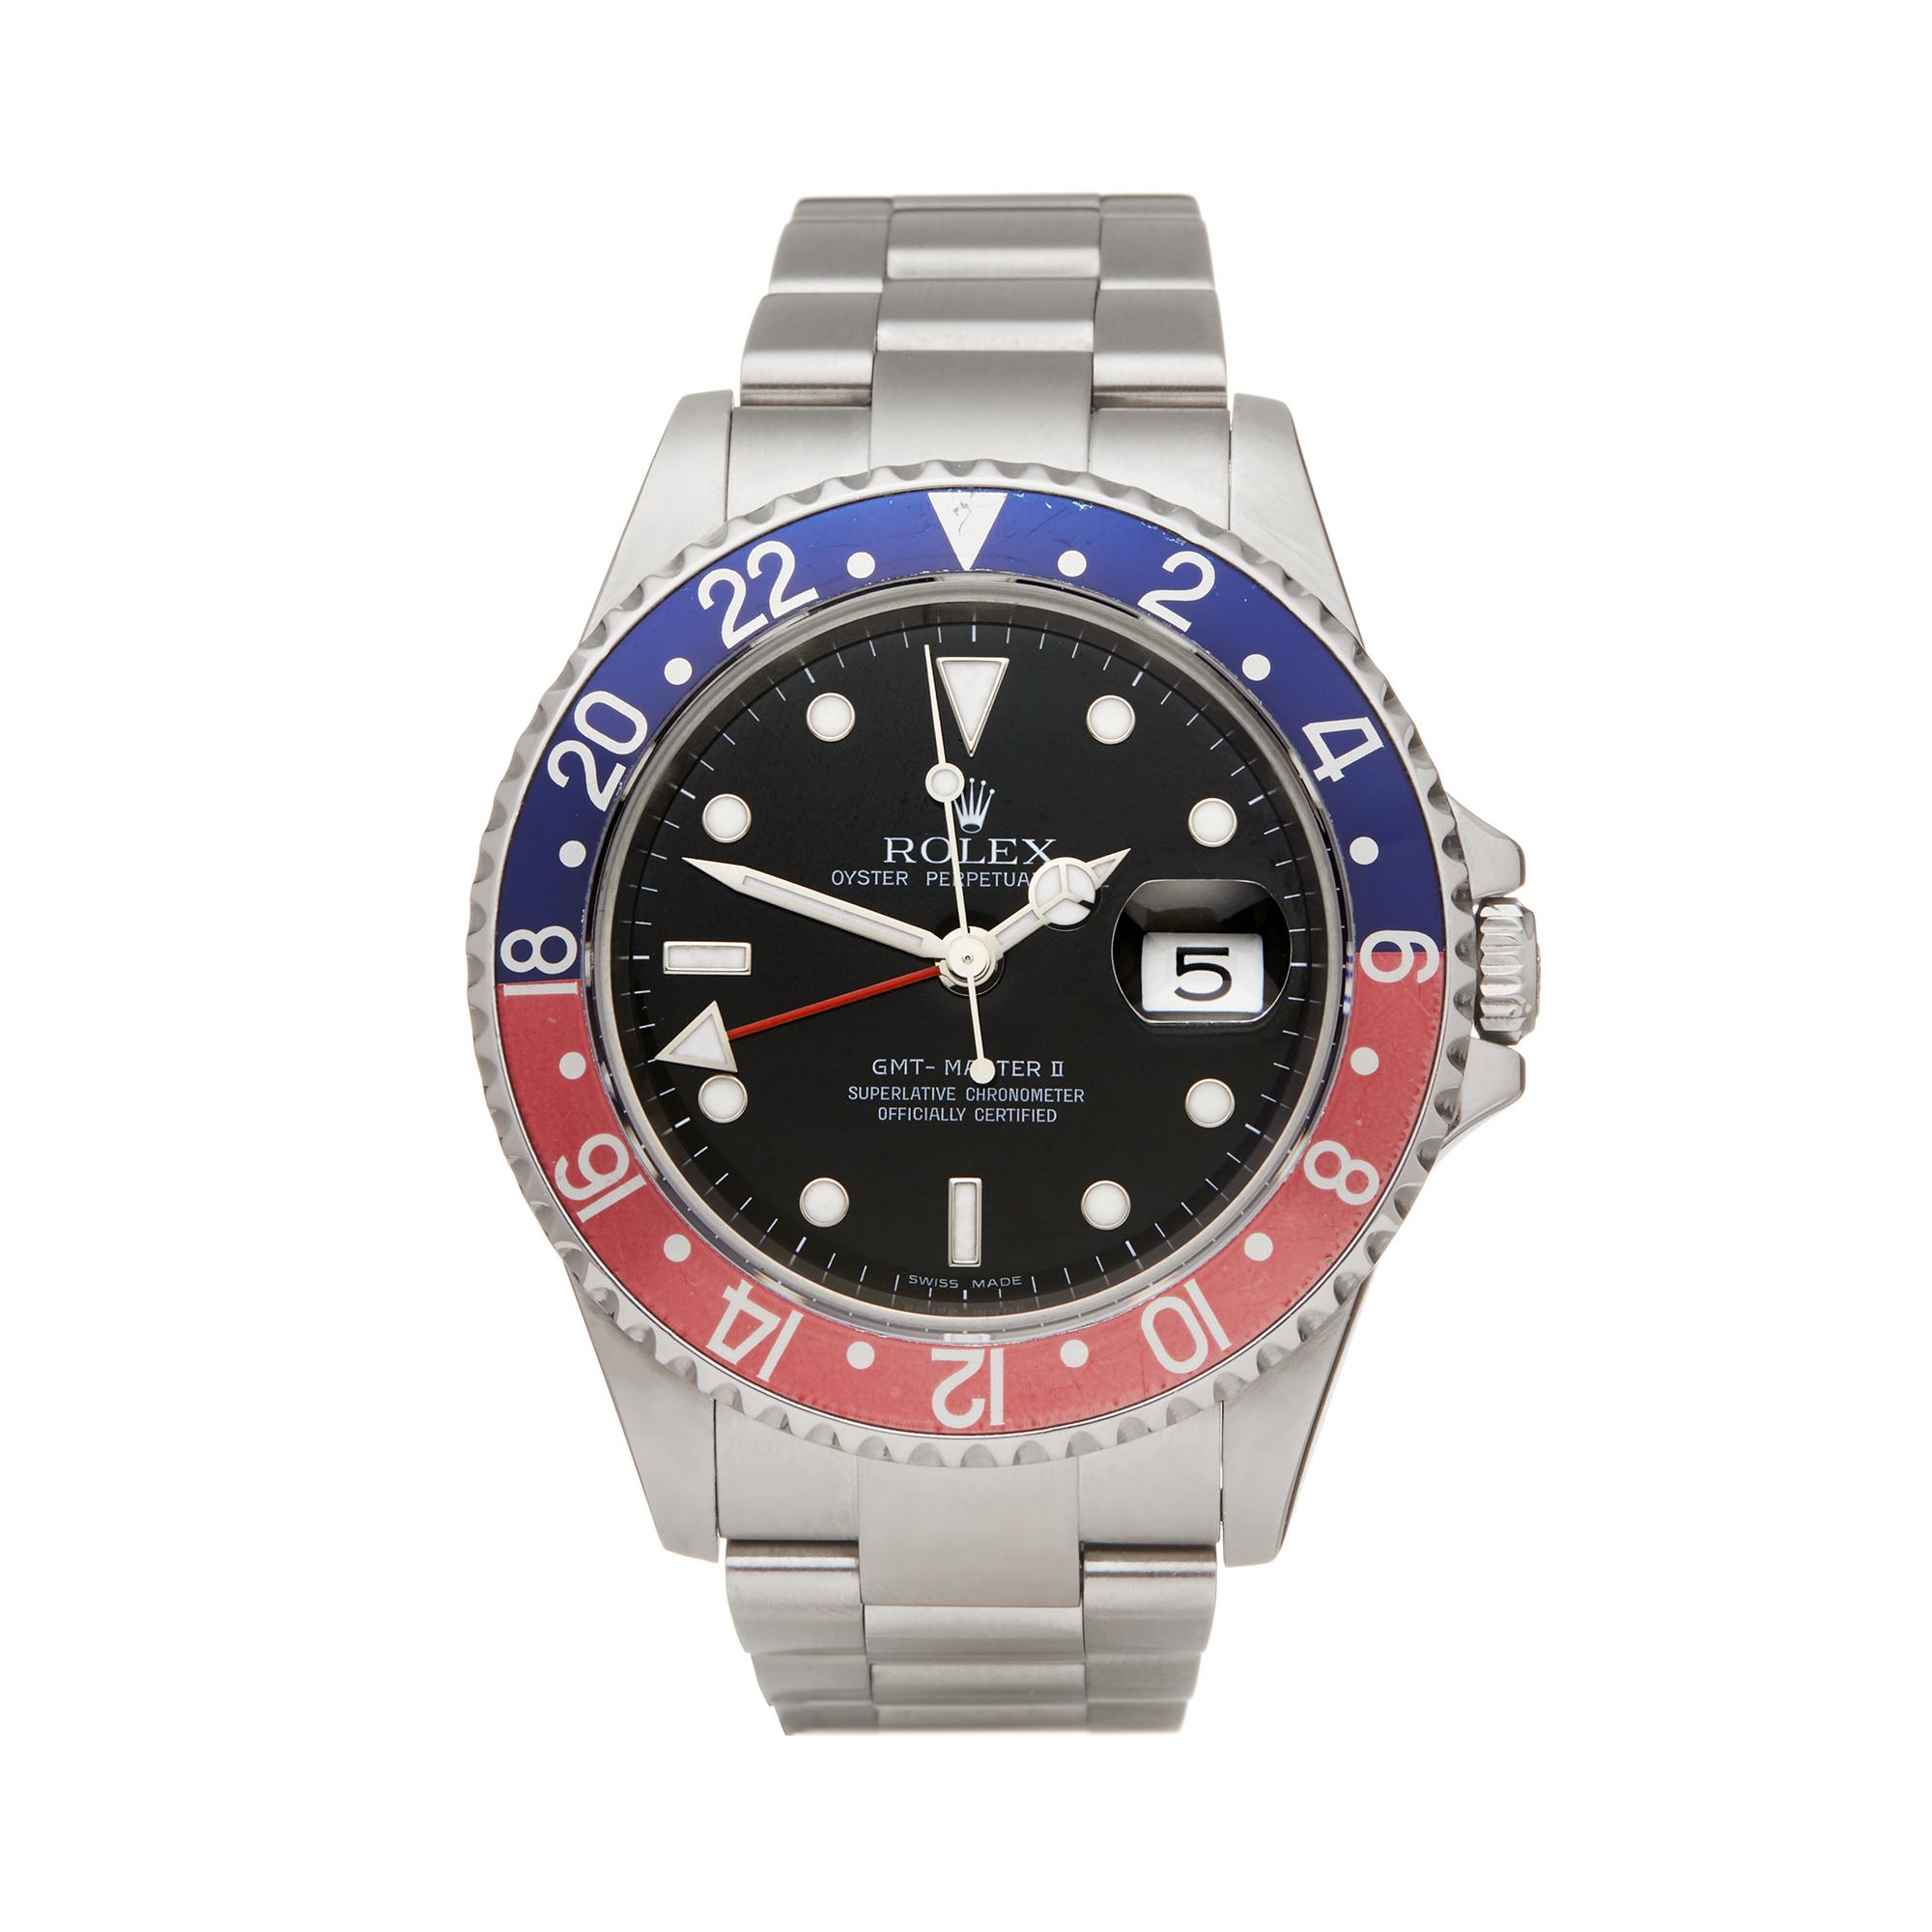 Details about ROLEX PEPSI RECTANGULAR DIAL GMT,MASTER II WATCH 16710 40MM  W5941